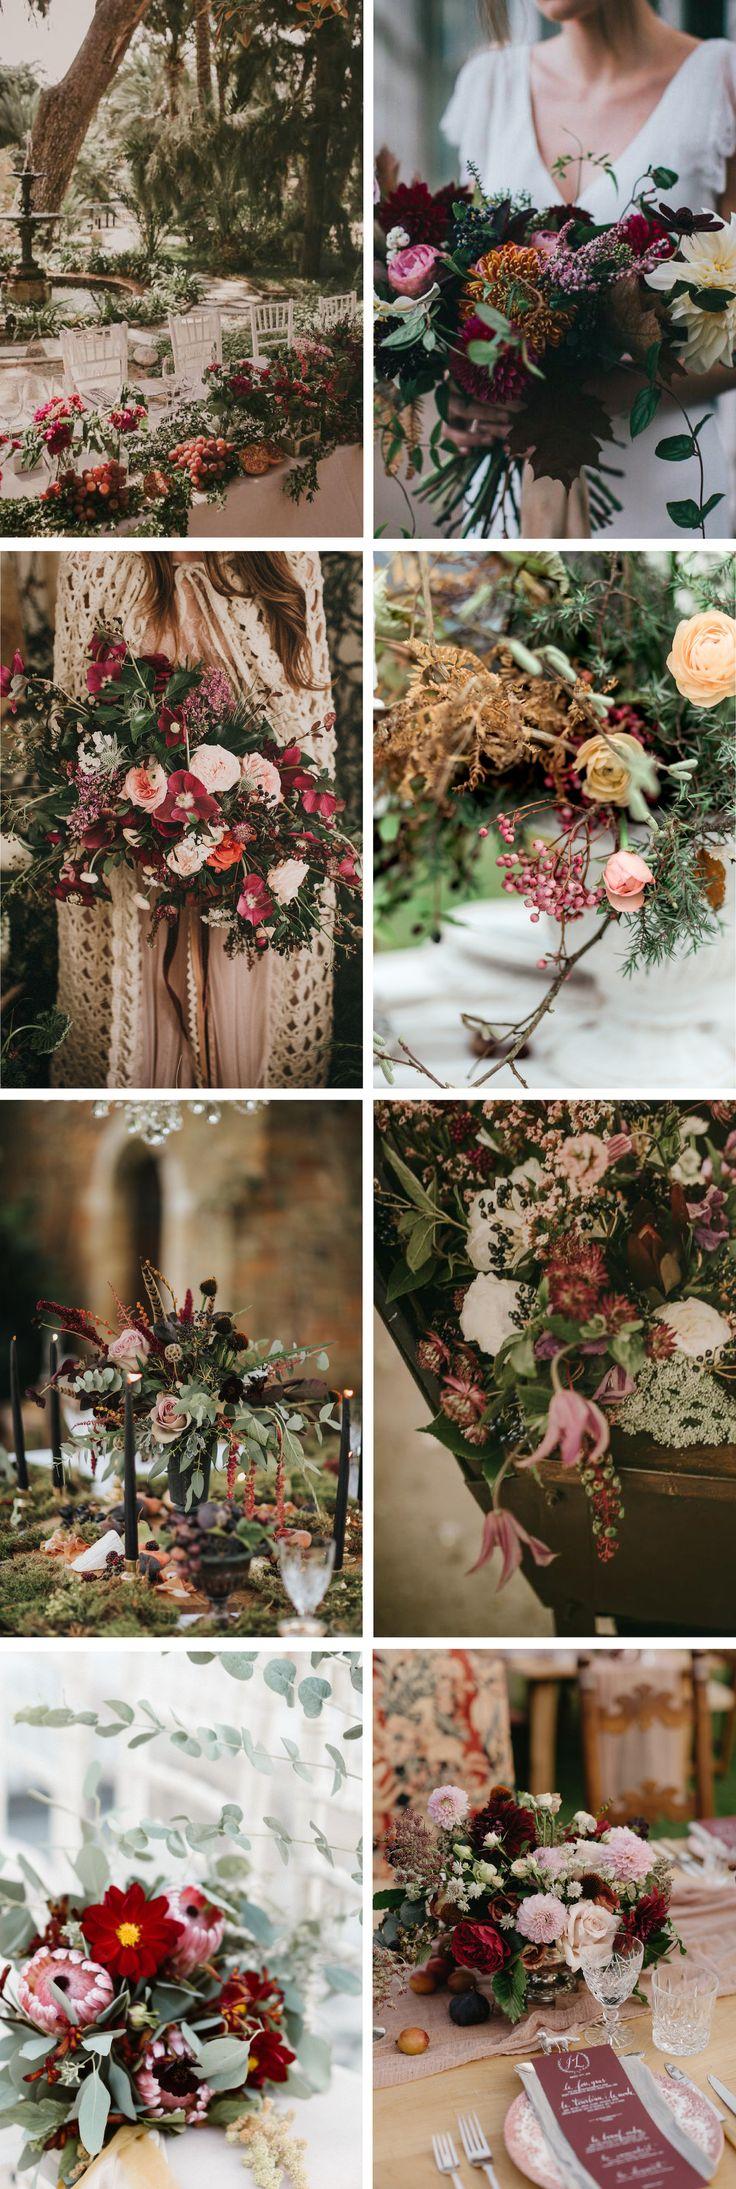 Jewel Tone and Gold Autumn Wedding Inspiration